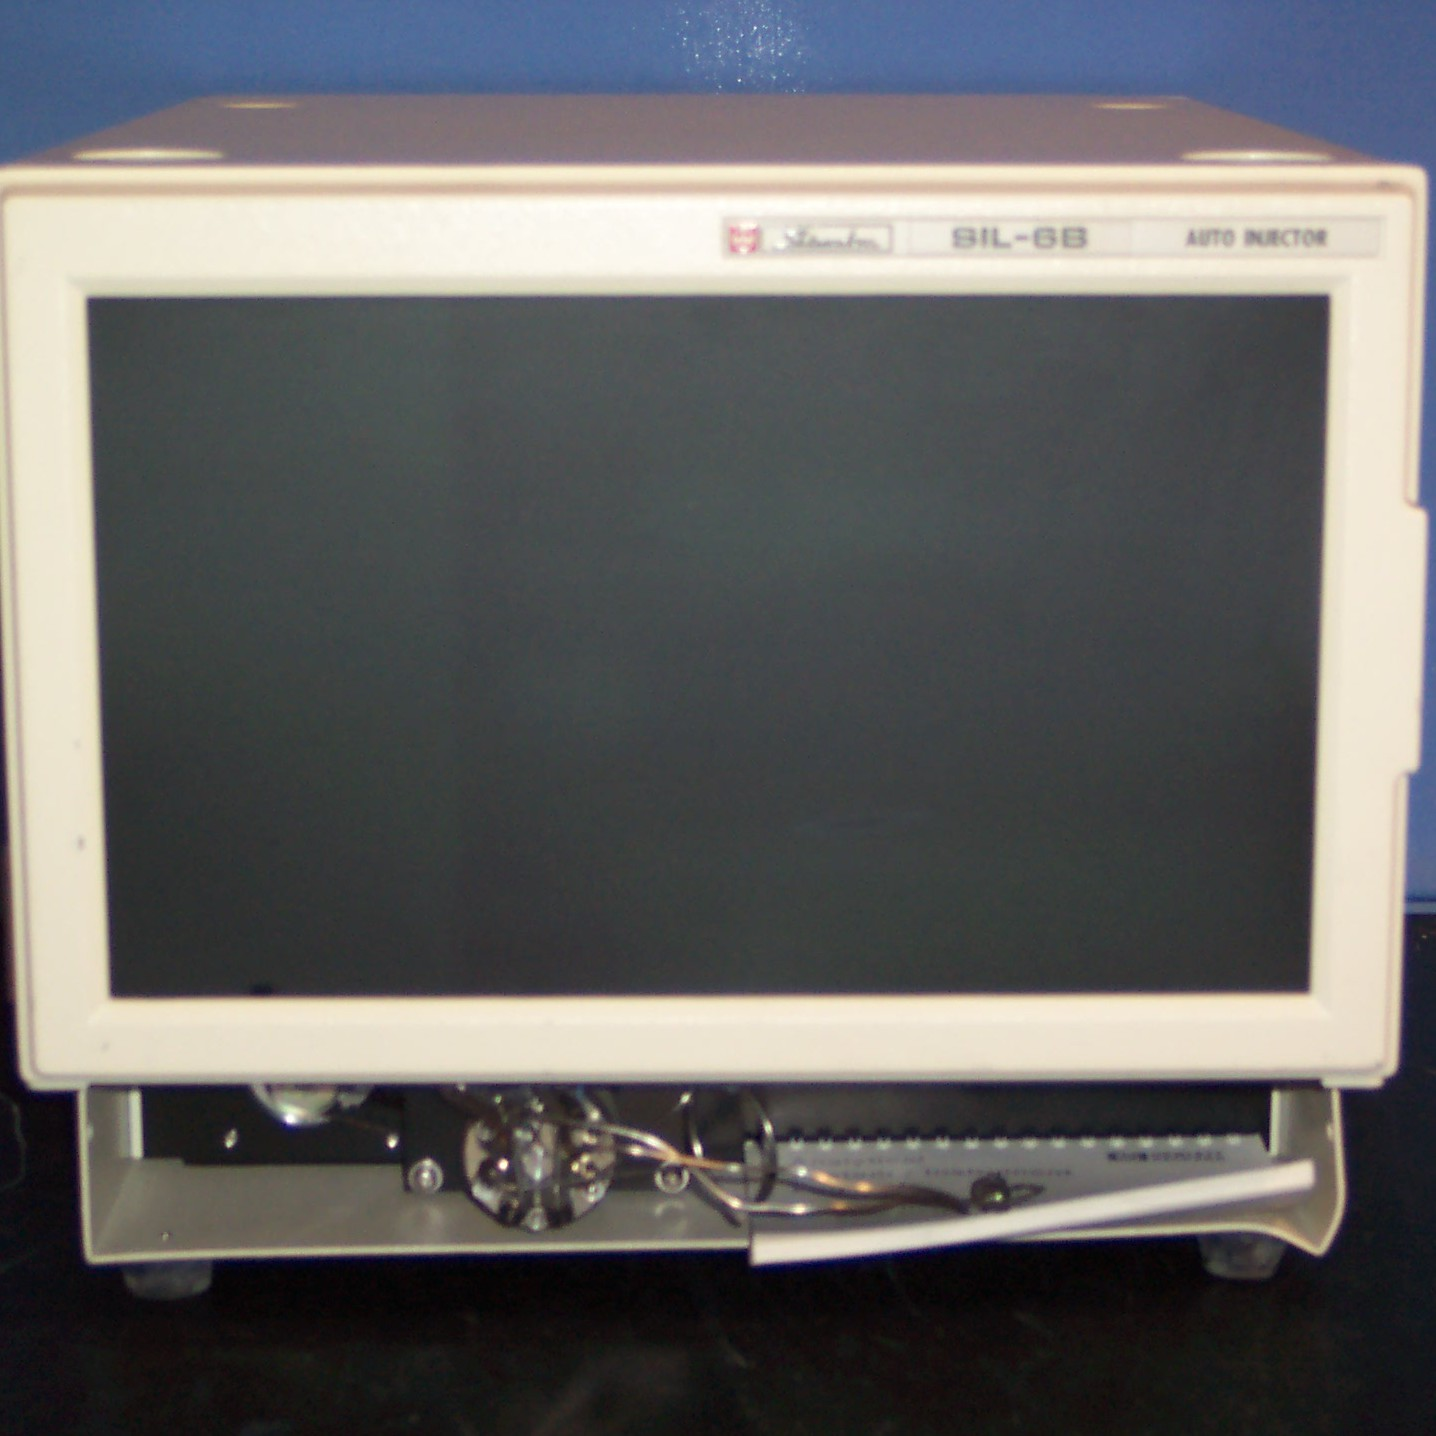 Shimadzu Auto Injector Model SIL-6B Image